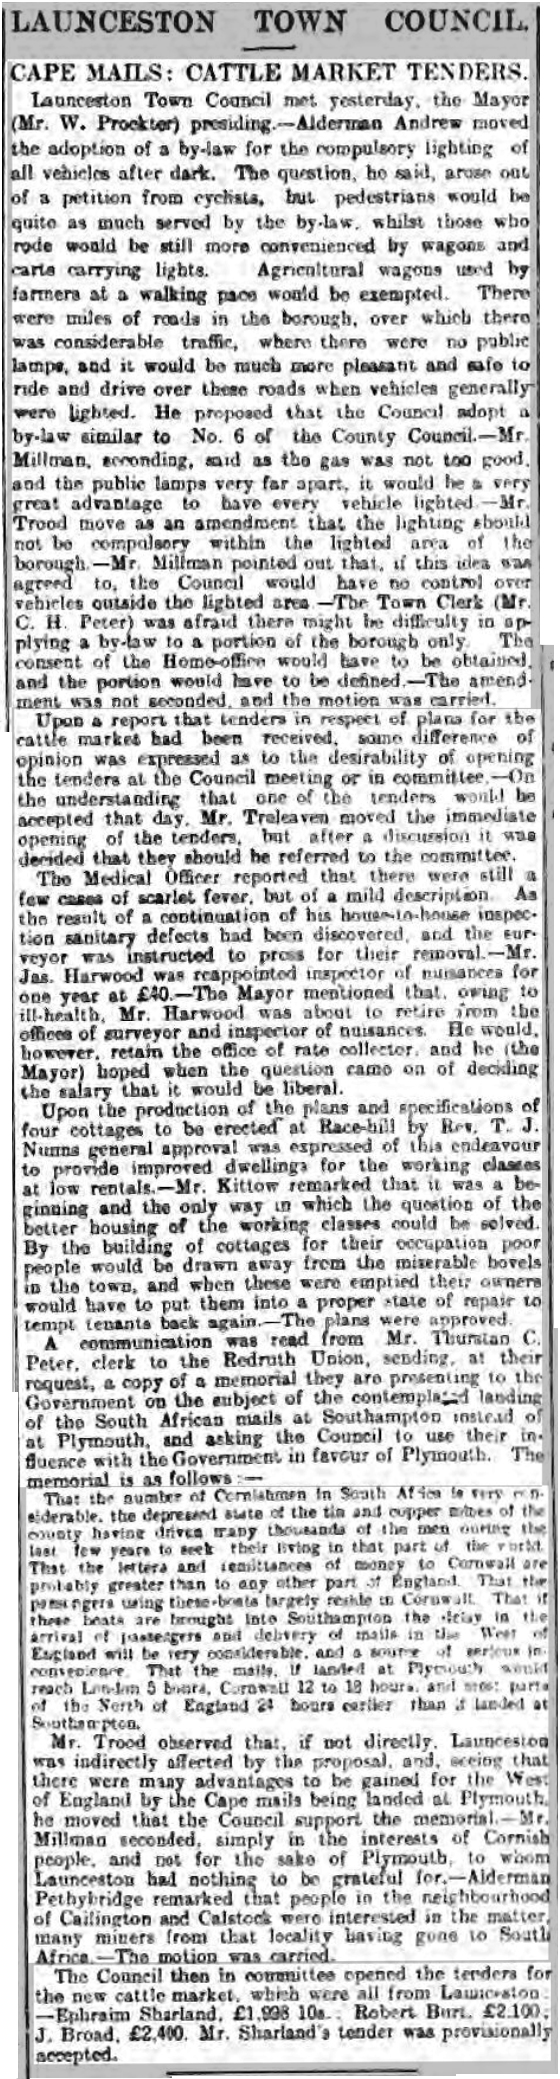 13 December 1898